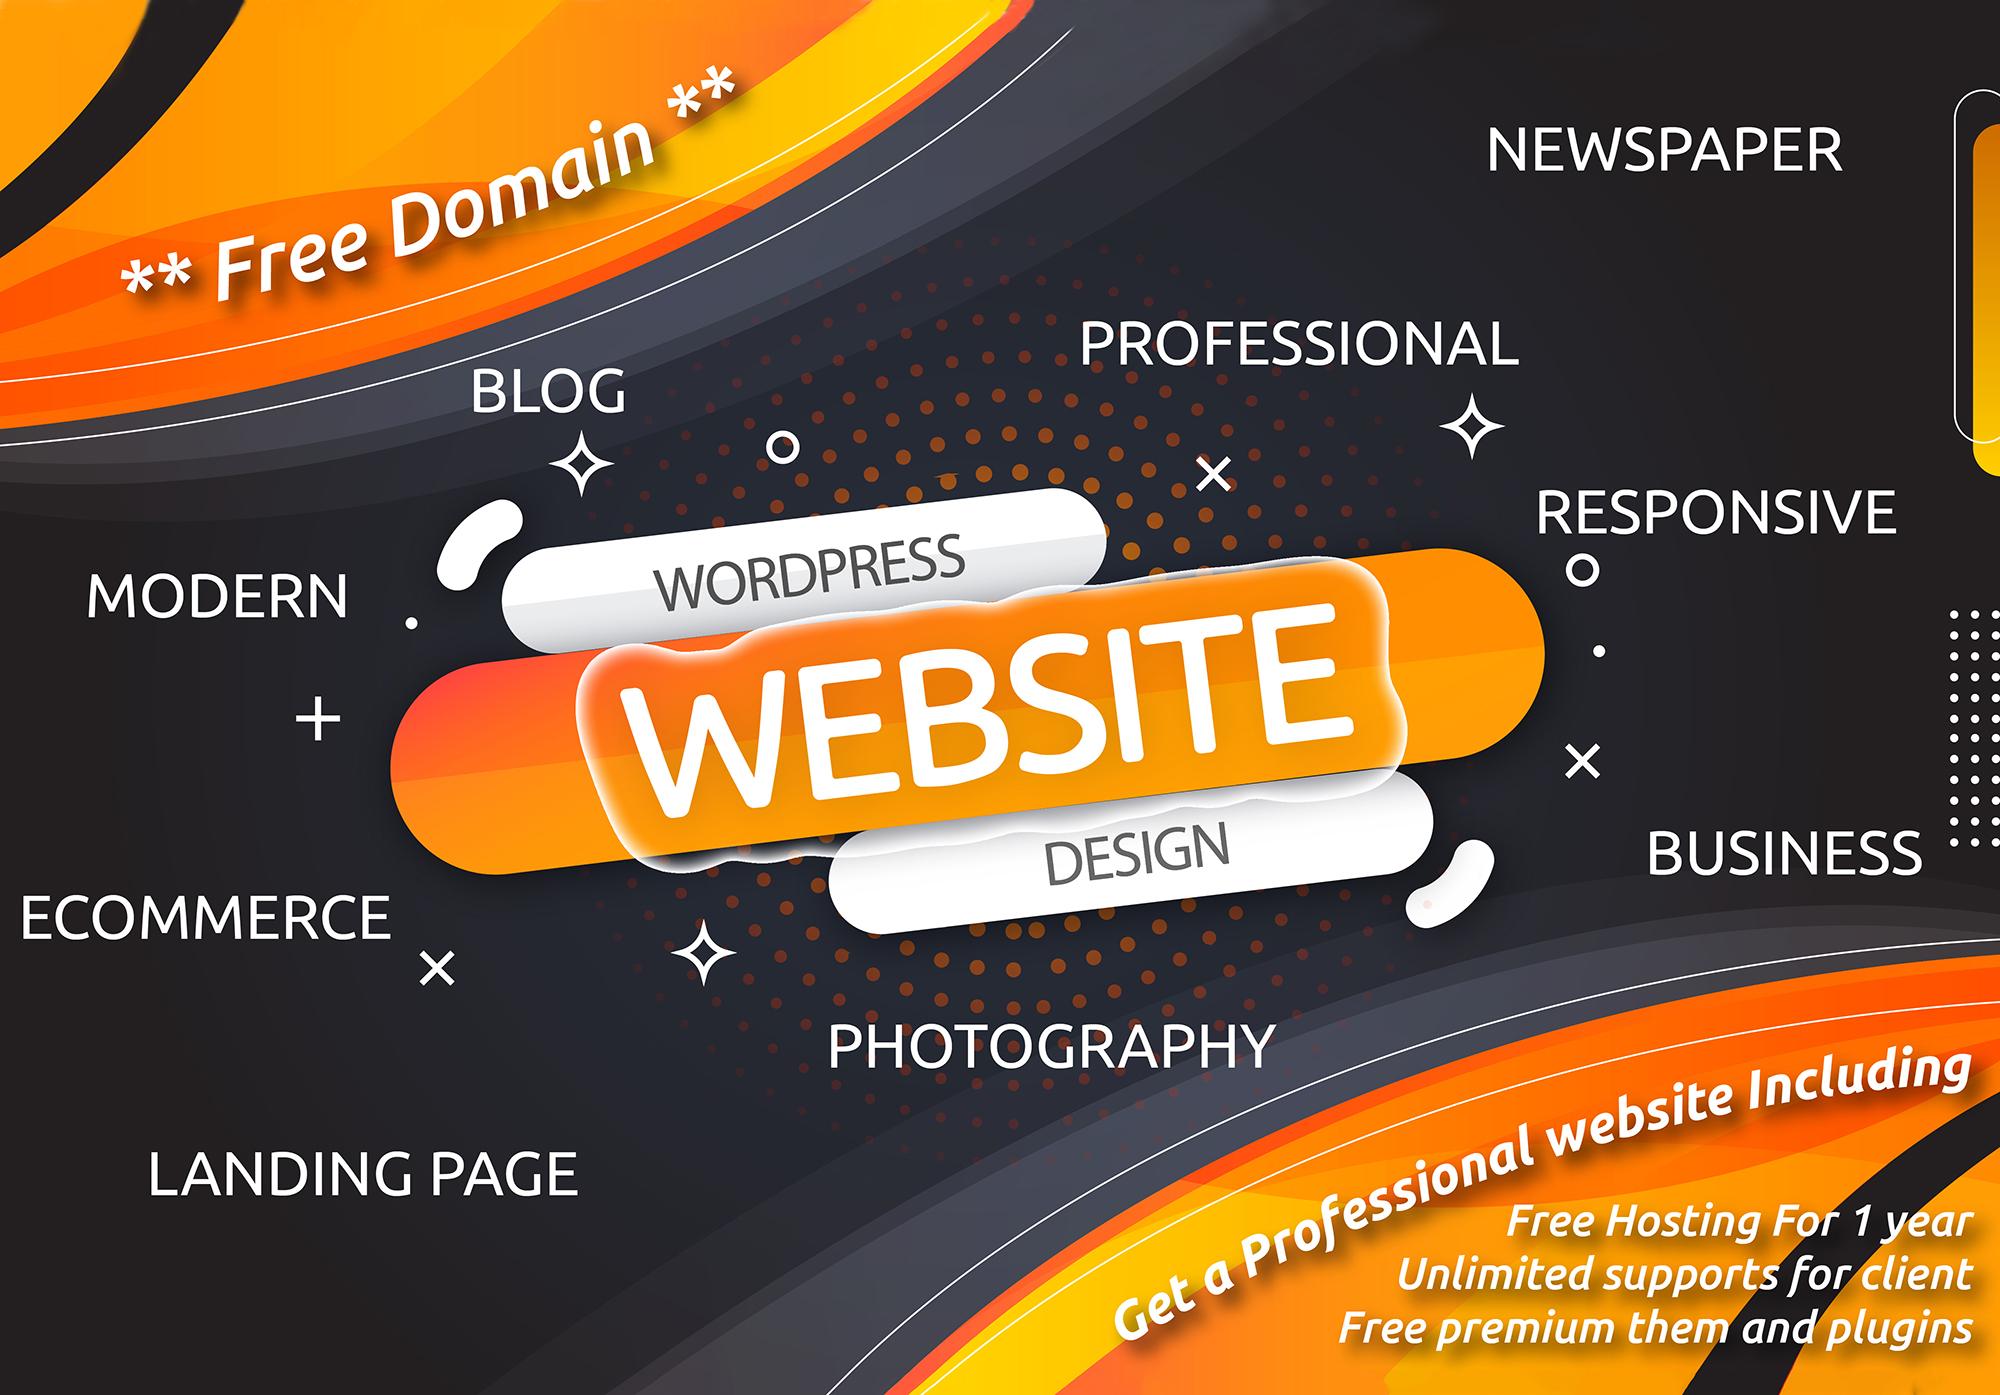 I will build a responsive high quality wordpress website design